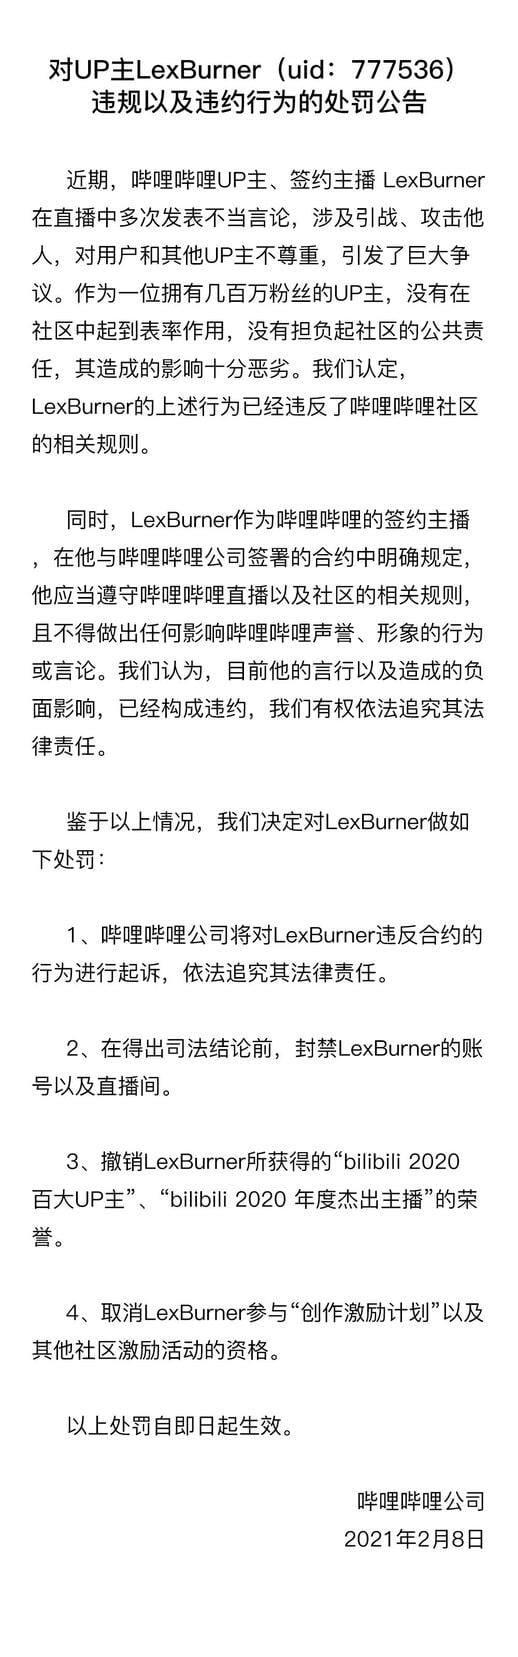 LexBurner失去百万UP主地位,重新启动的再次人生(伪)